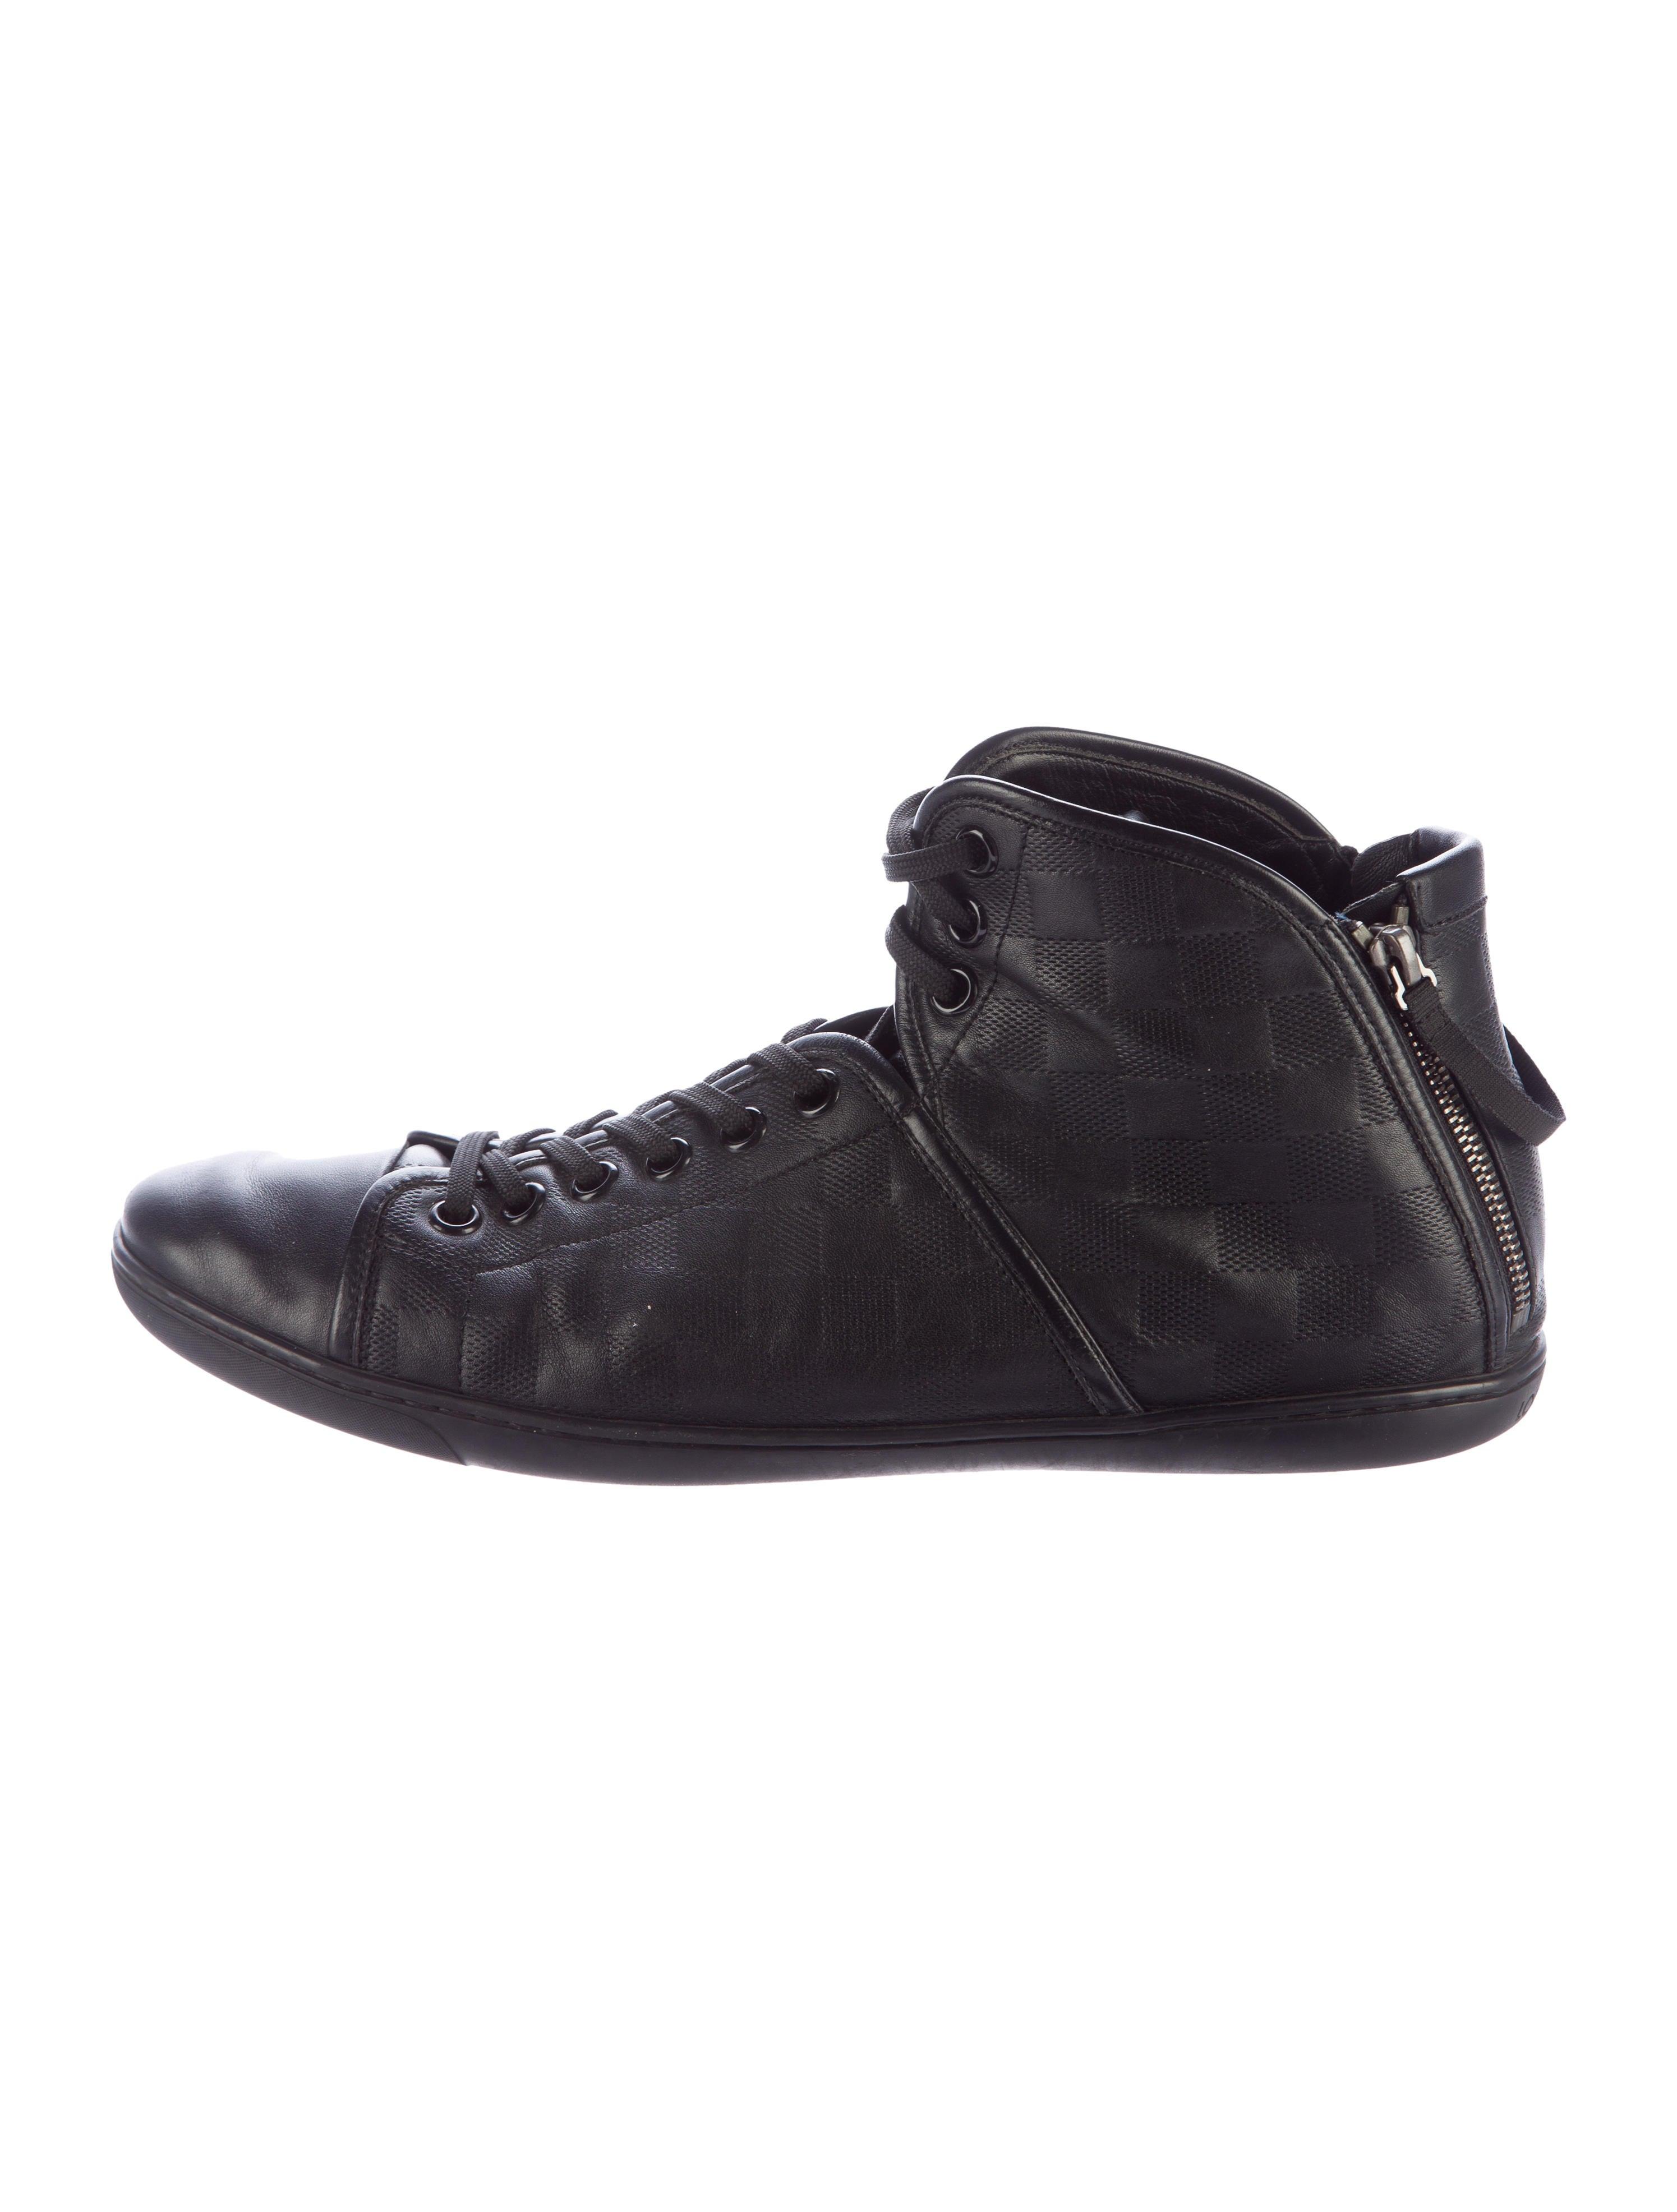 louis vuitton damier hightop sneakers mens shoes